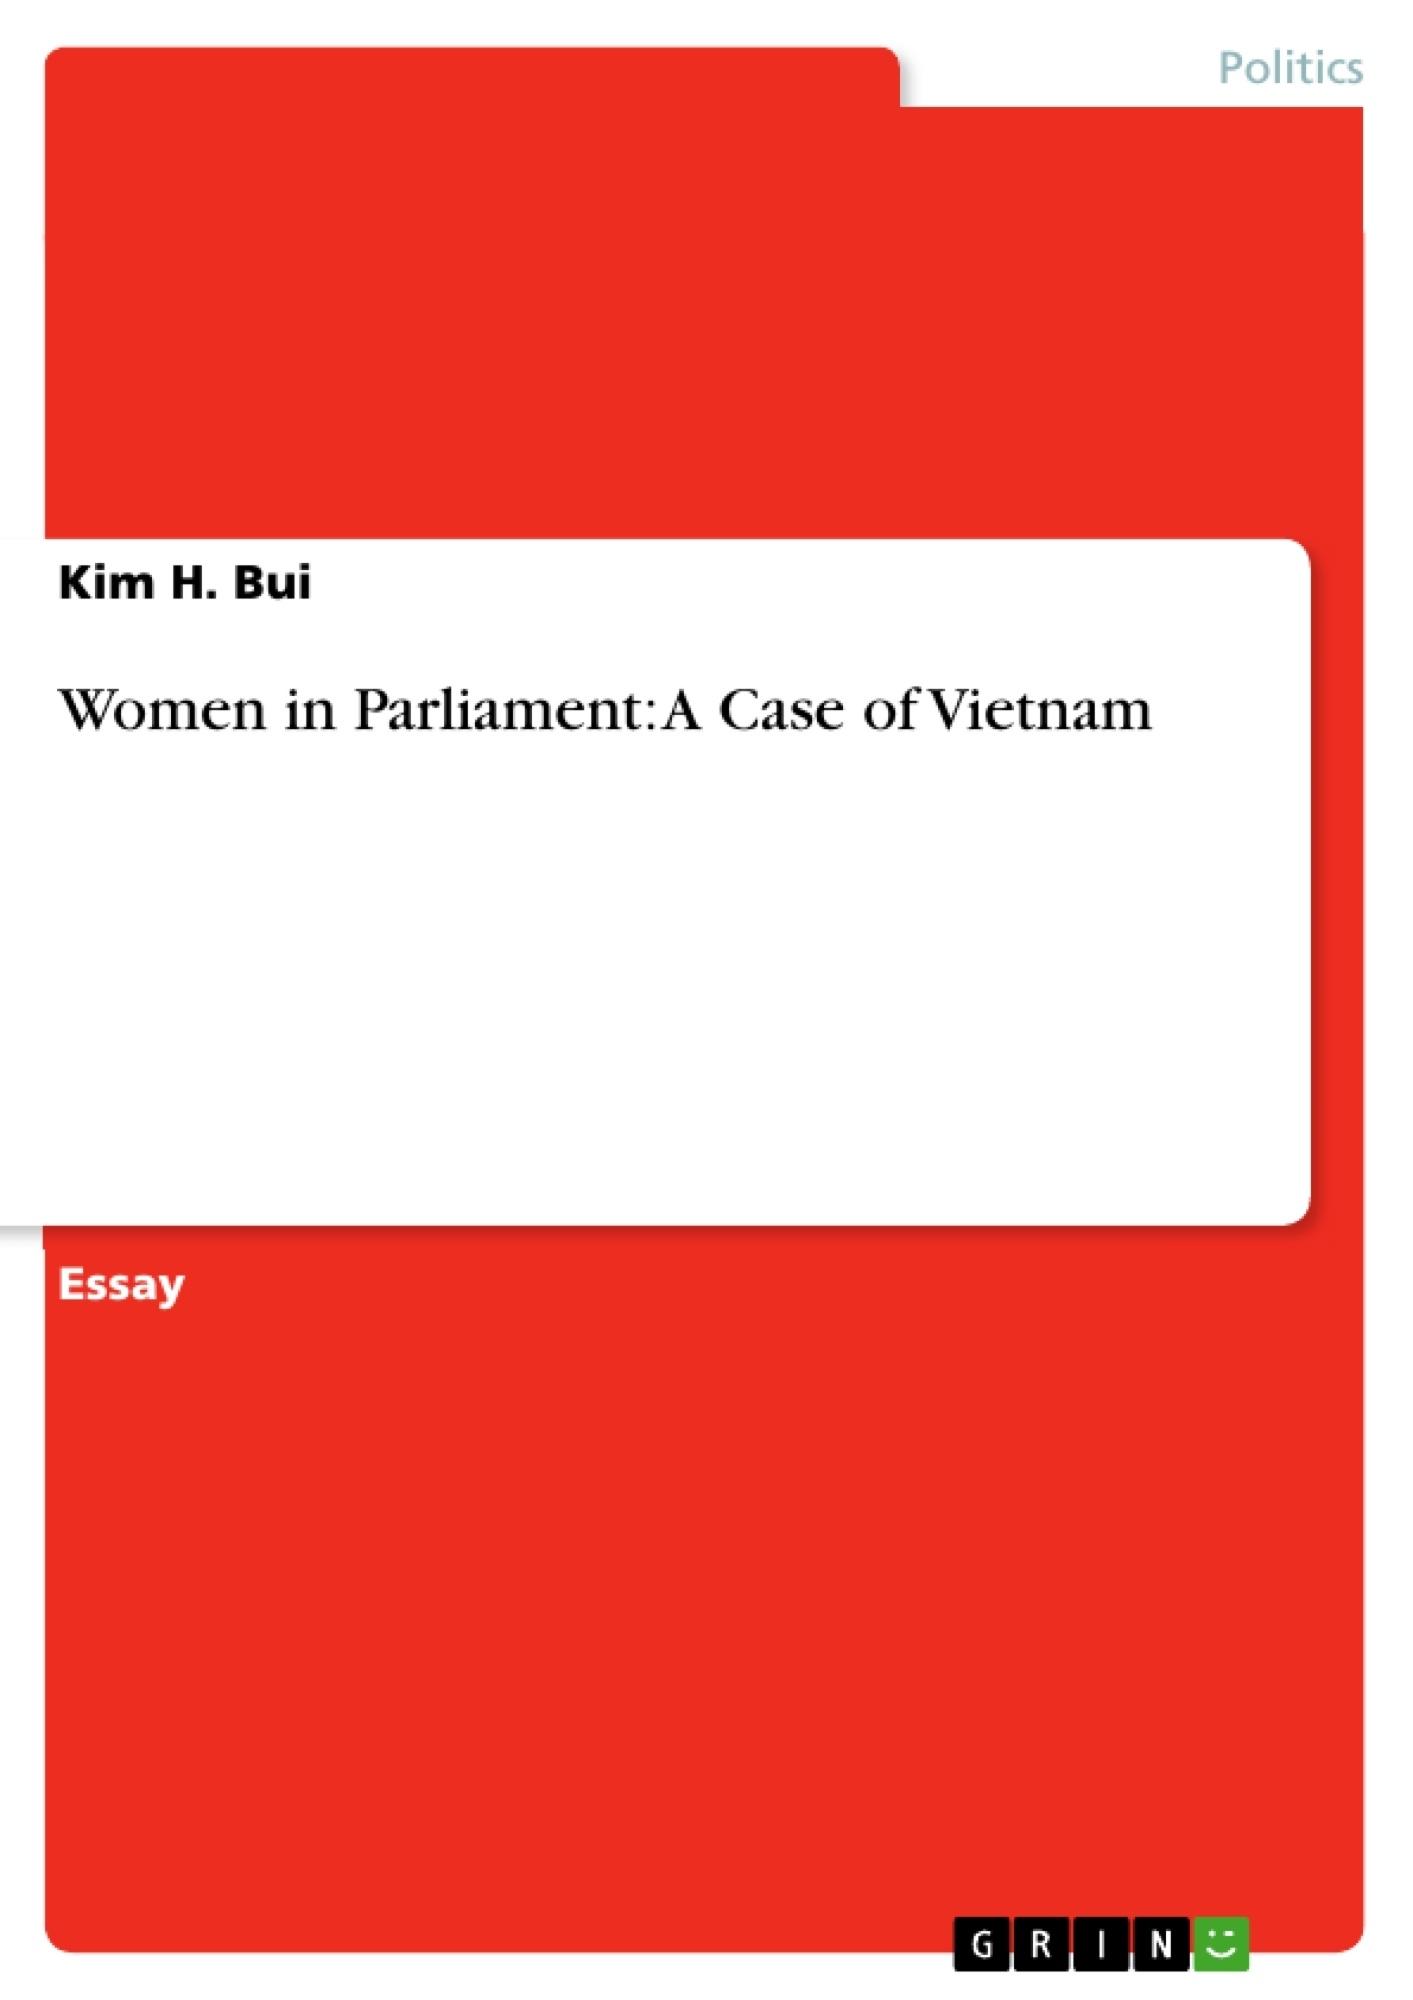 Title: Women in Parliament: A Case of Vietnam